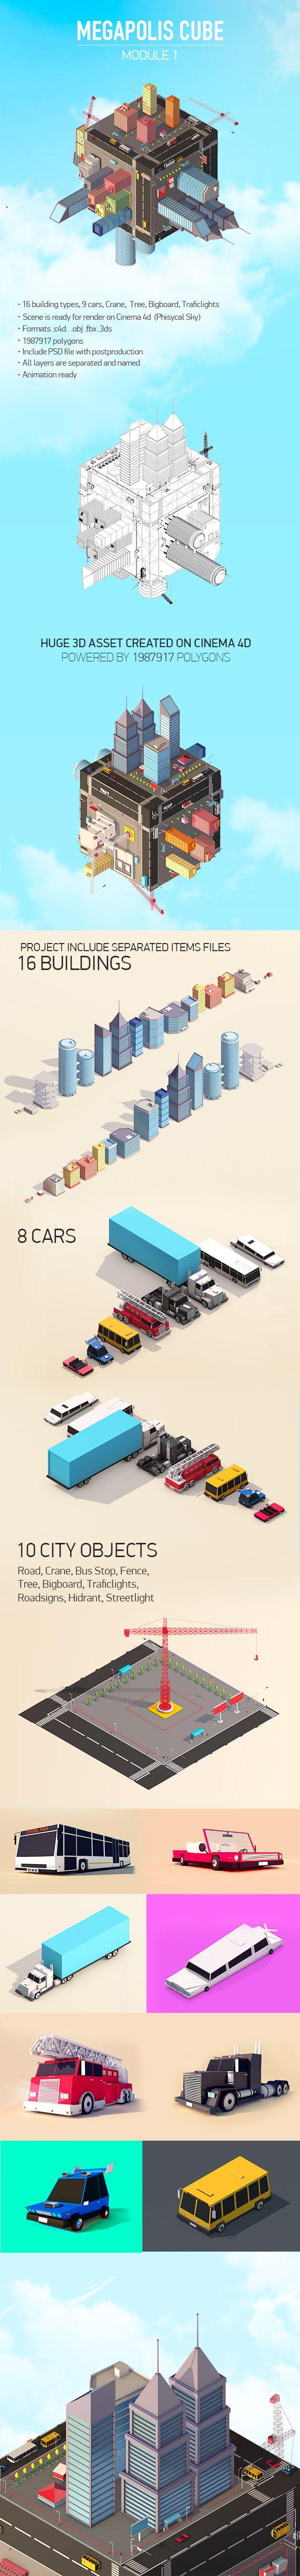 Low Poly Megapolis Cube Module 1 3D Models Design Template #cinema4d #3D #3dDesign Download here: https://3docean.net/item/megapolis-cube-module-1/15924594?ref=yinkira